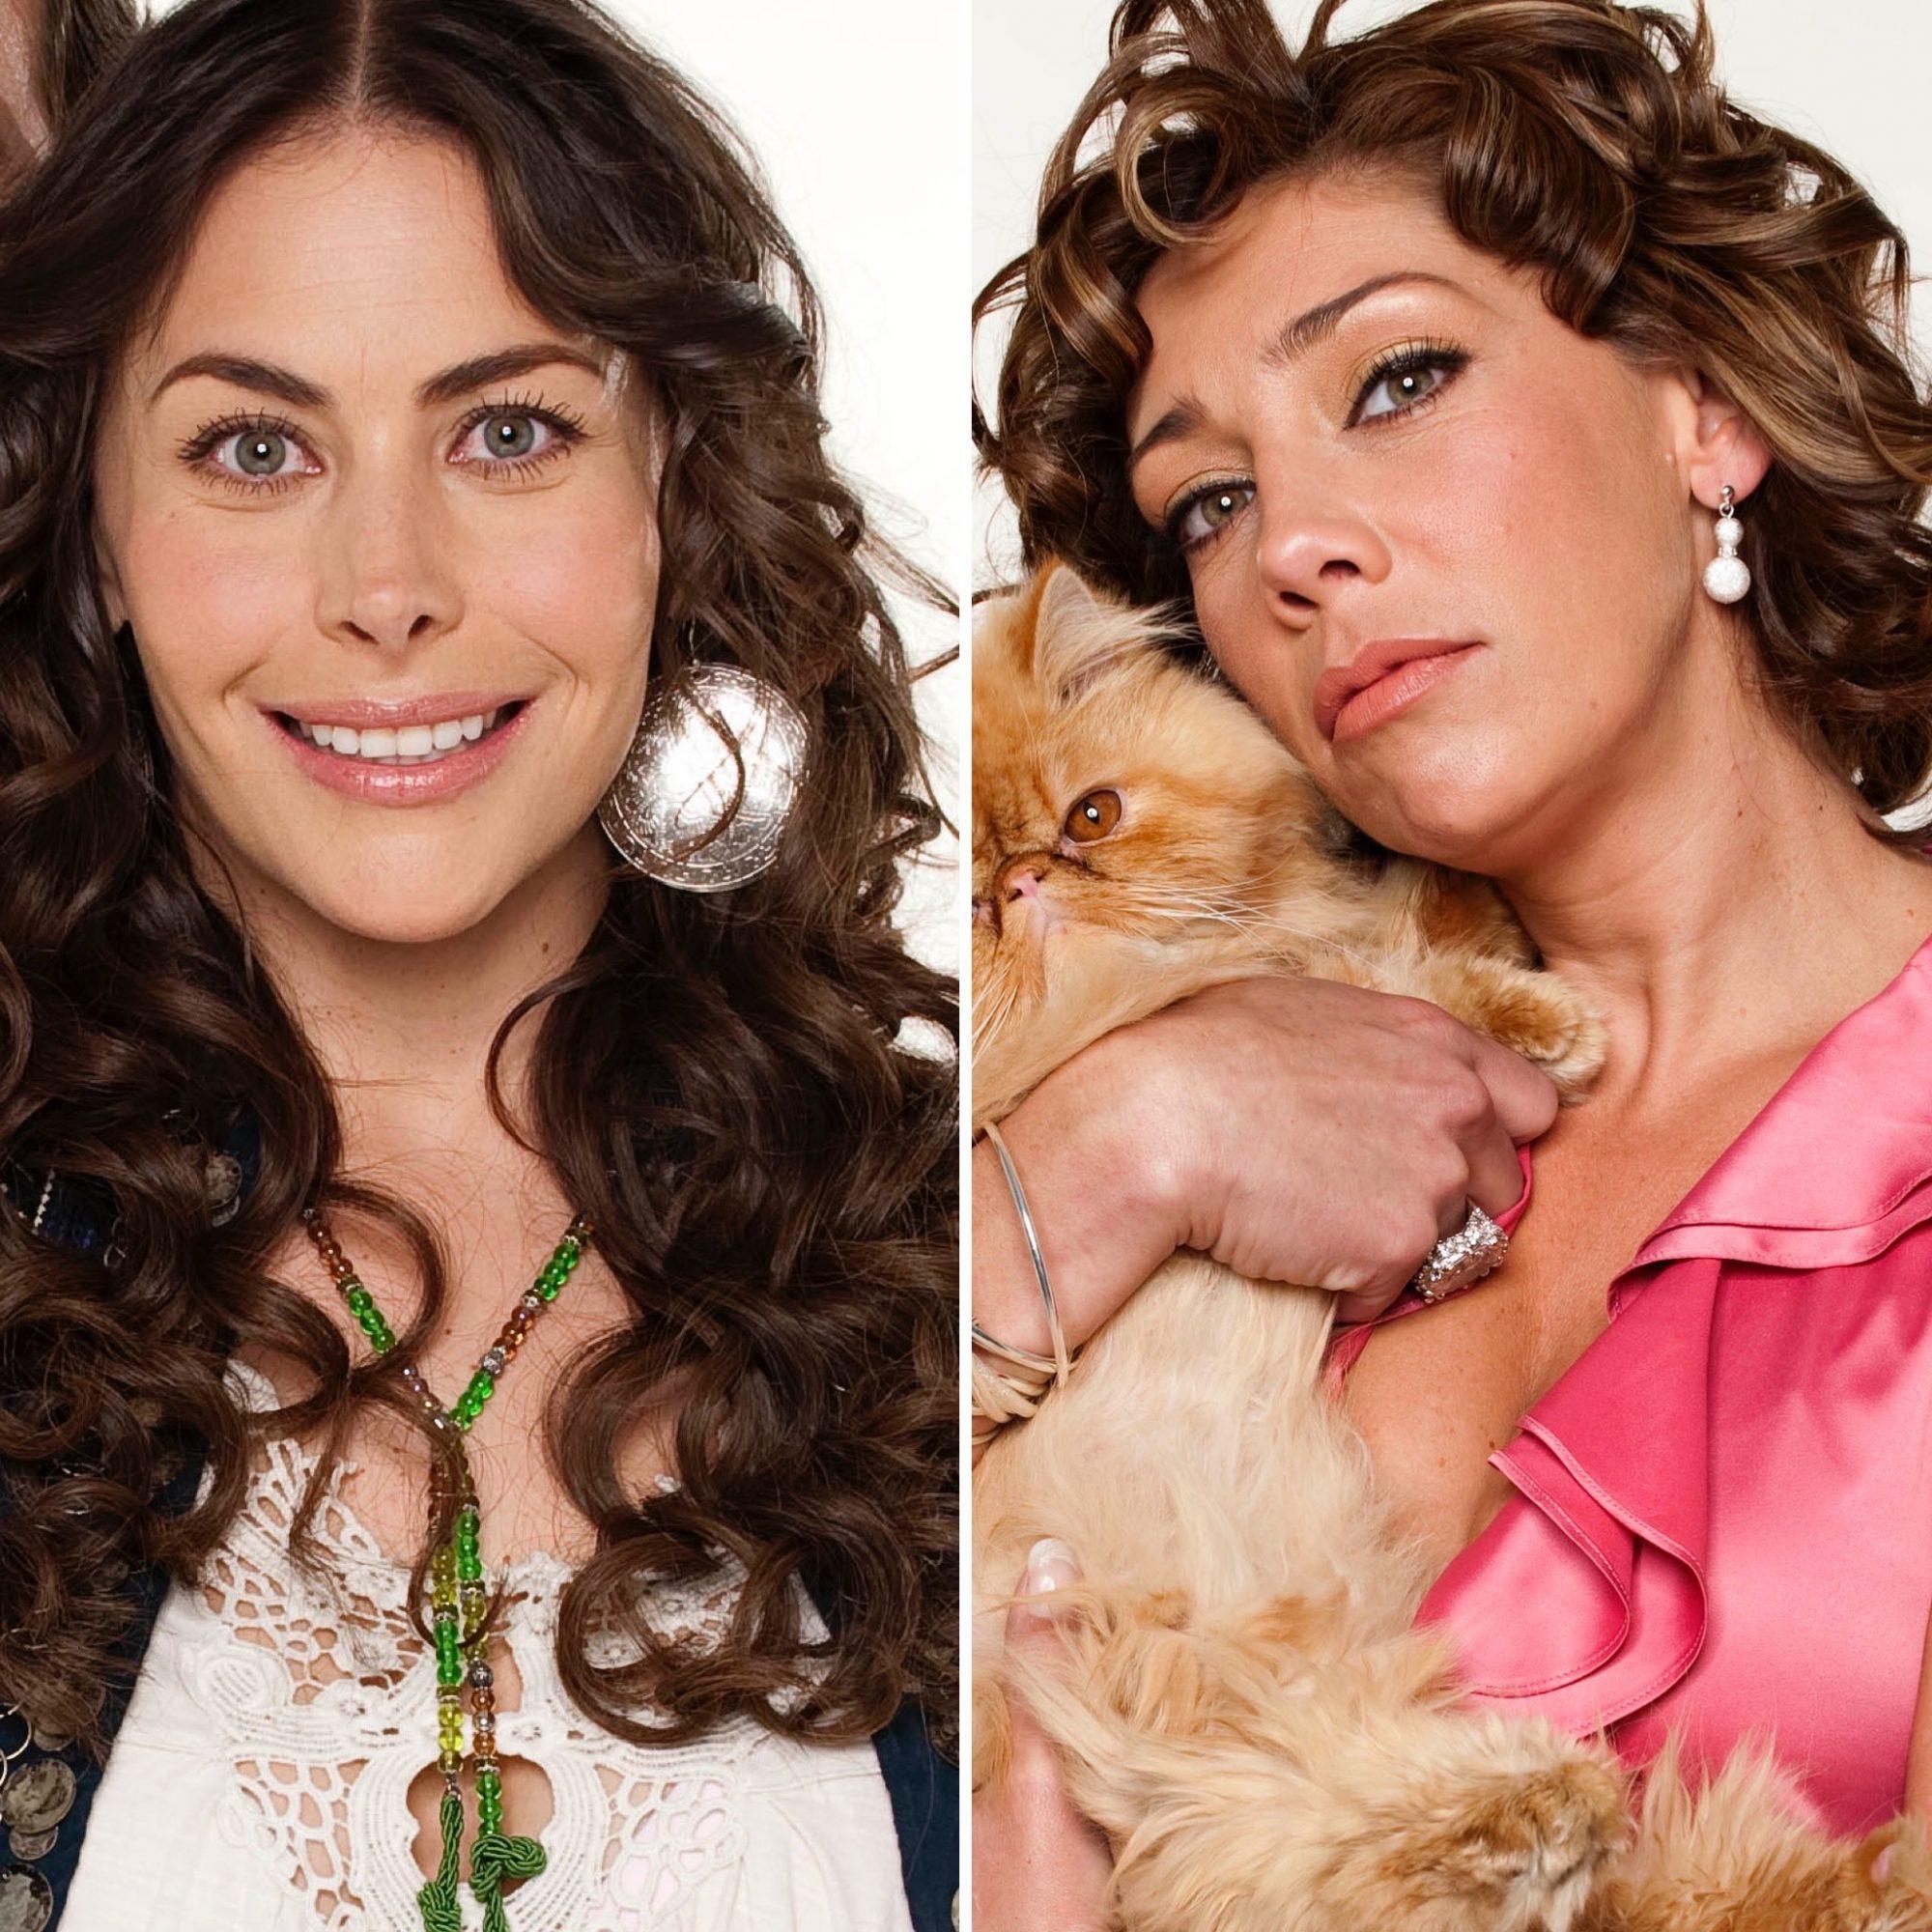 Vanessa Guzmán y Cynthia Klitbo en Atrévete a soñar